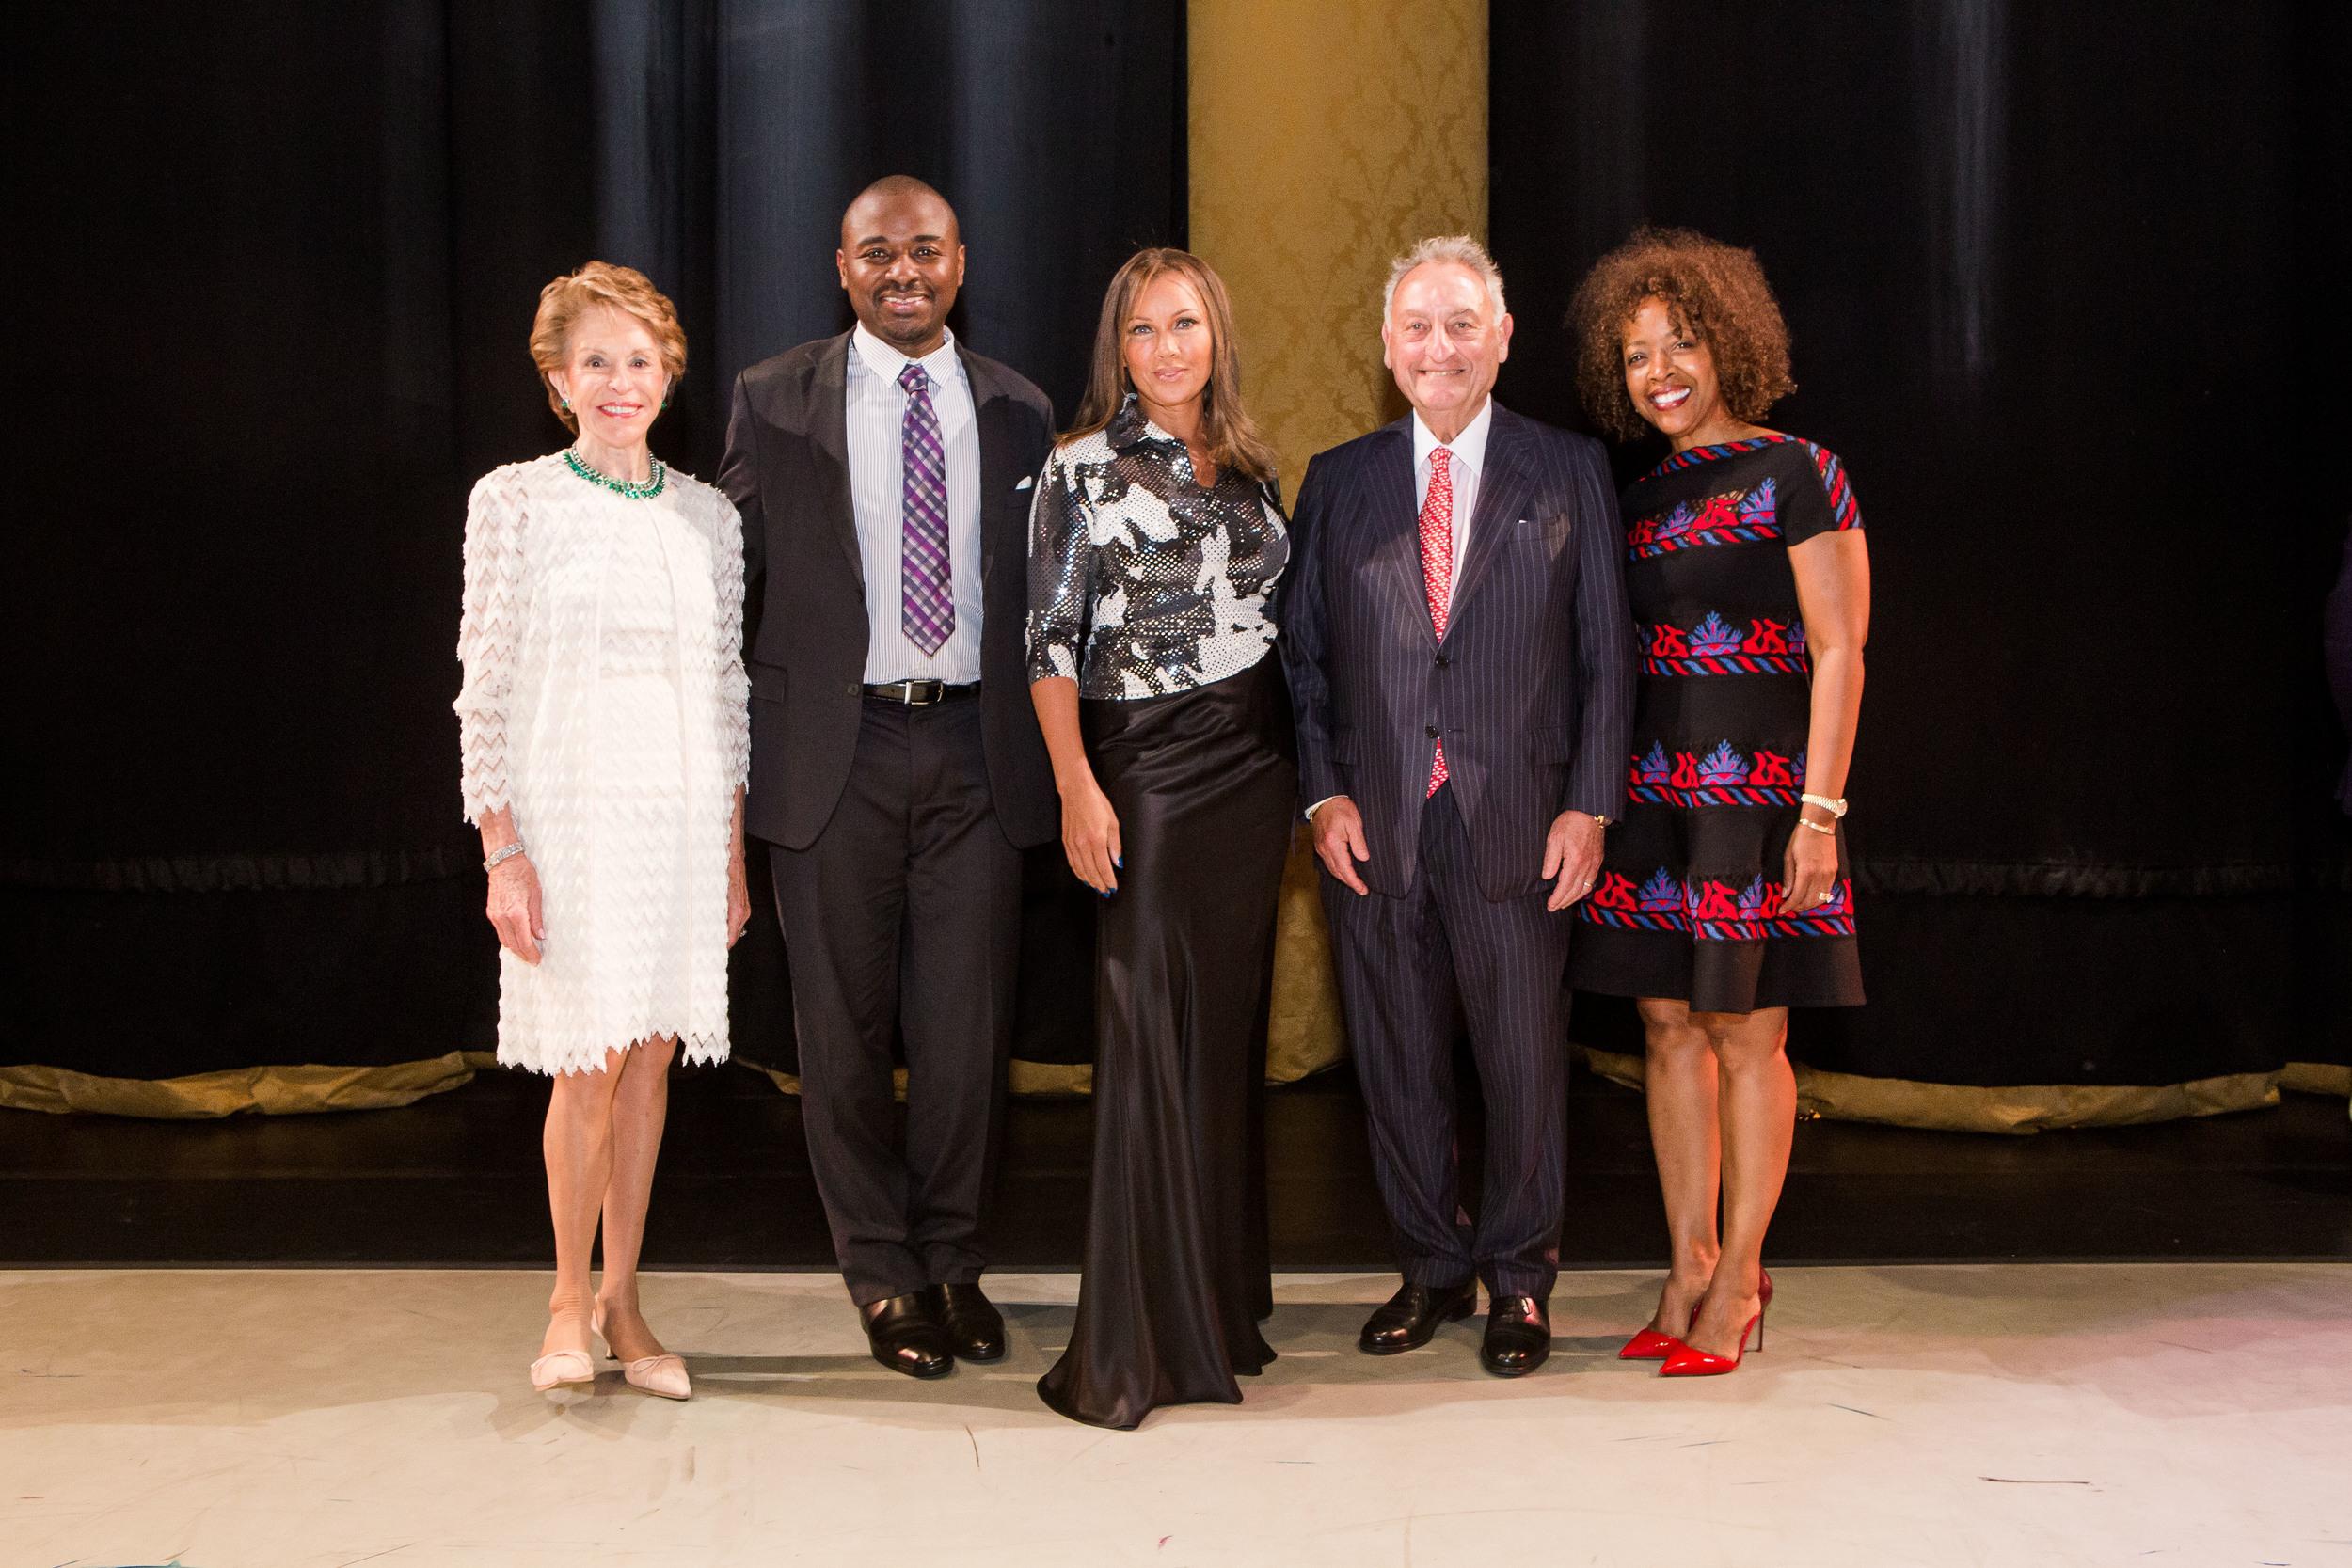 Joan Weill, Robert Battle, Vanessa Williams, Sanford Weill, and Gina Adams at the 2014 Ailey Spirit Gala at Lincoln Center. Photo by Dario Calmese Jr.